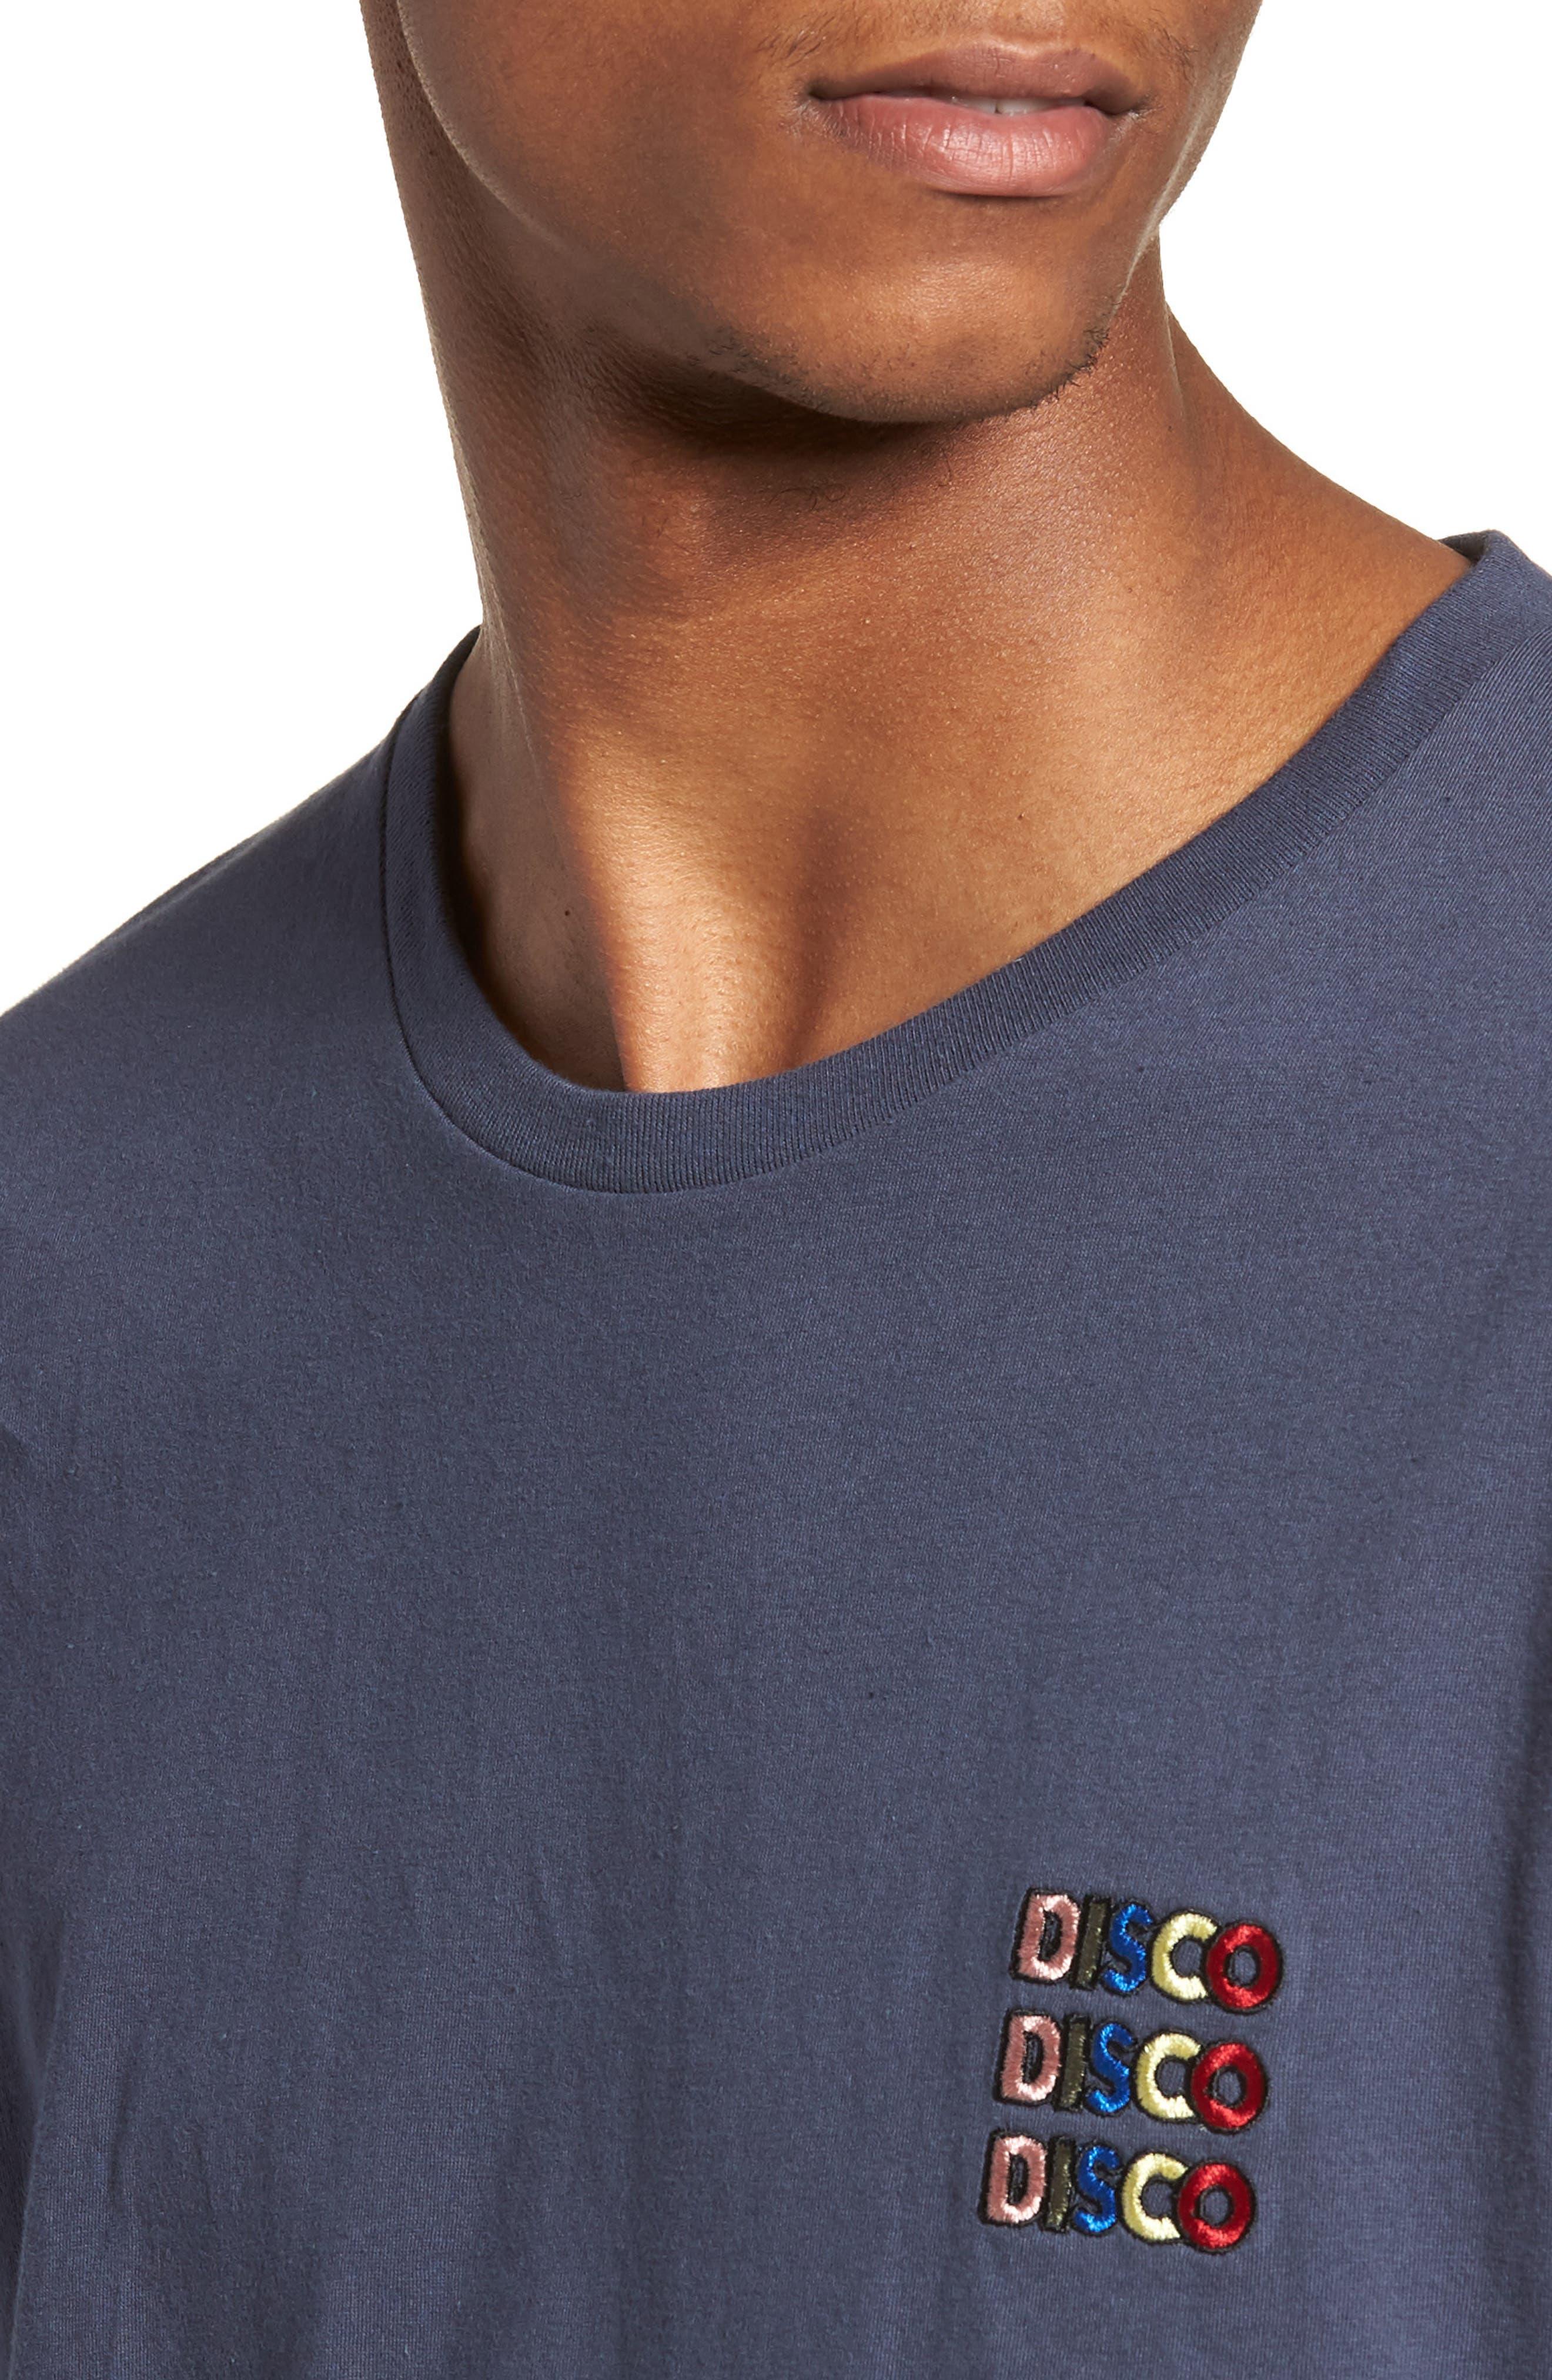 Disco T-Shirt,                             Alternate thumbnail 4, color,                             Slate